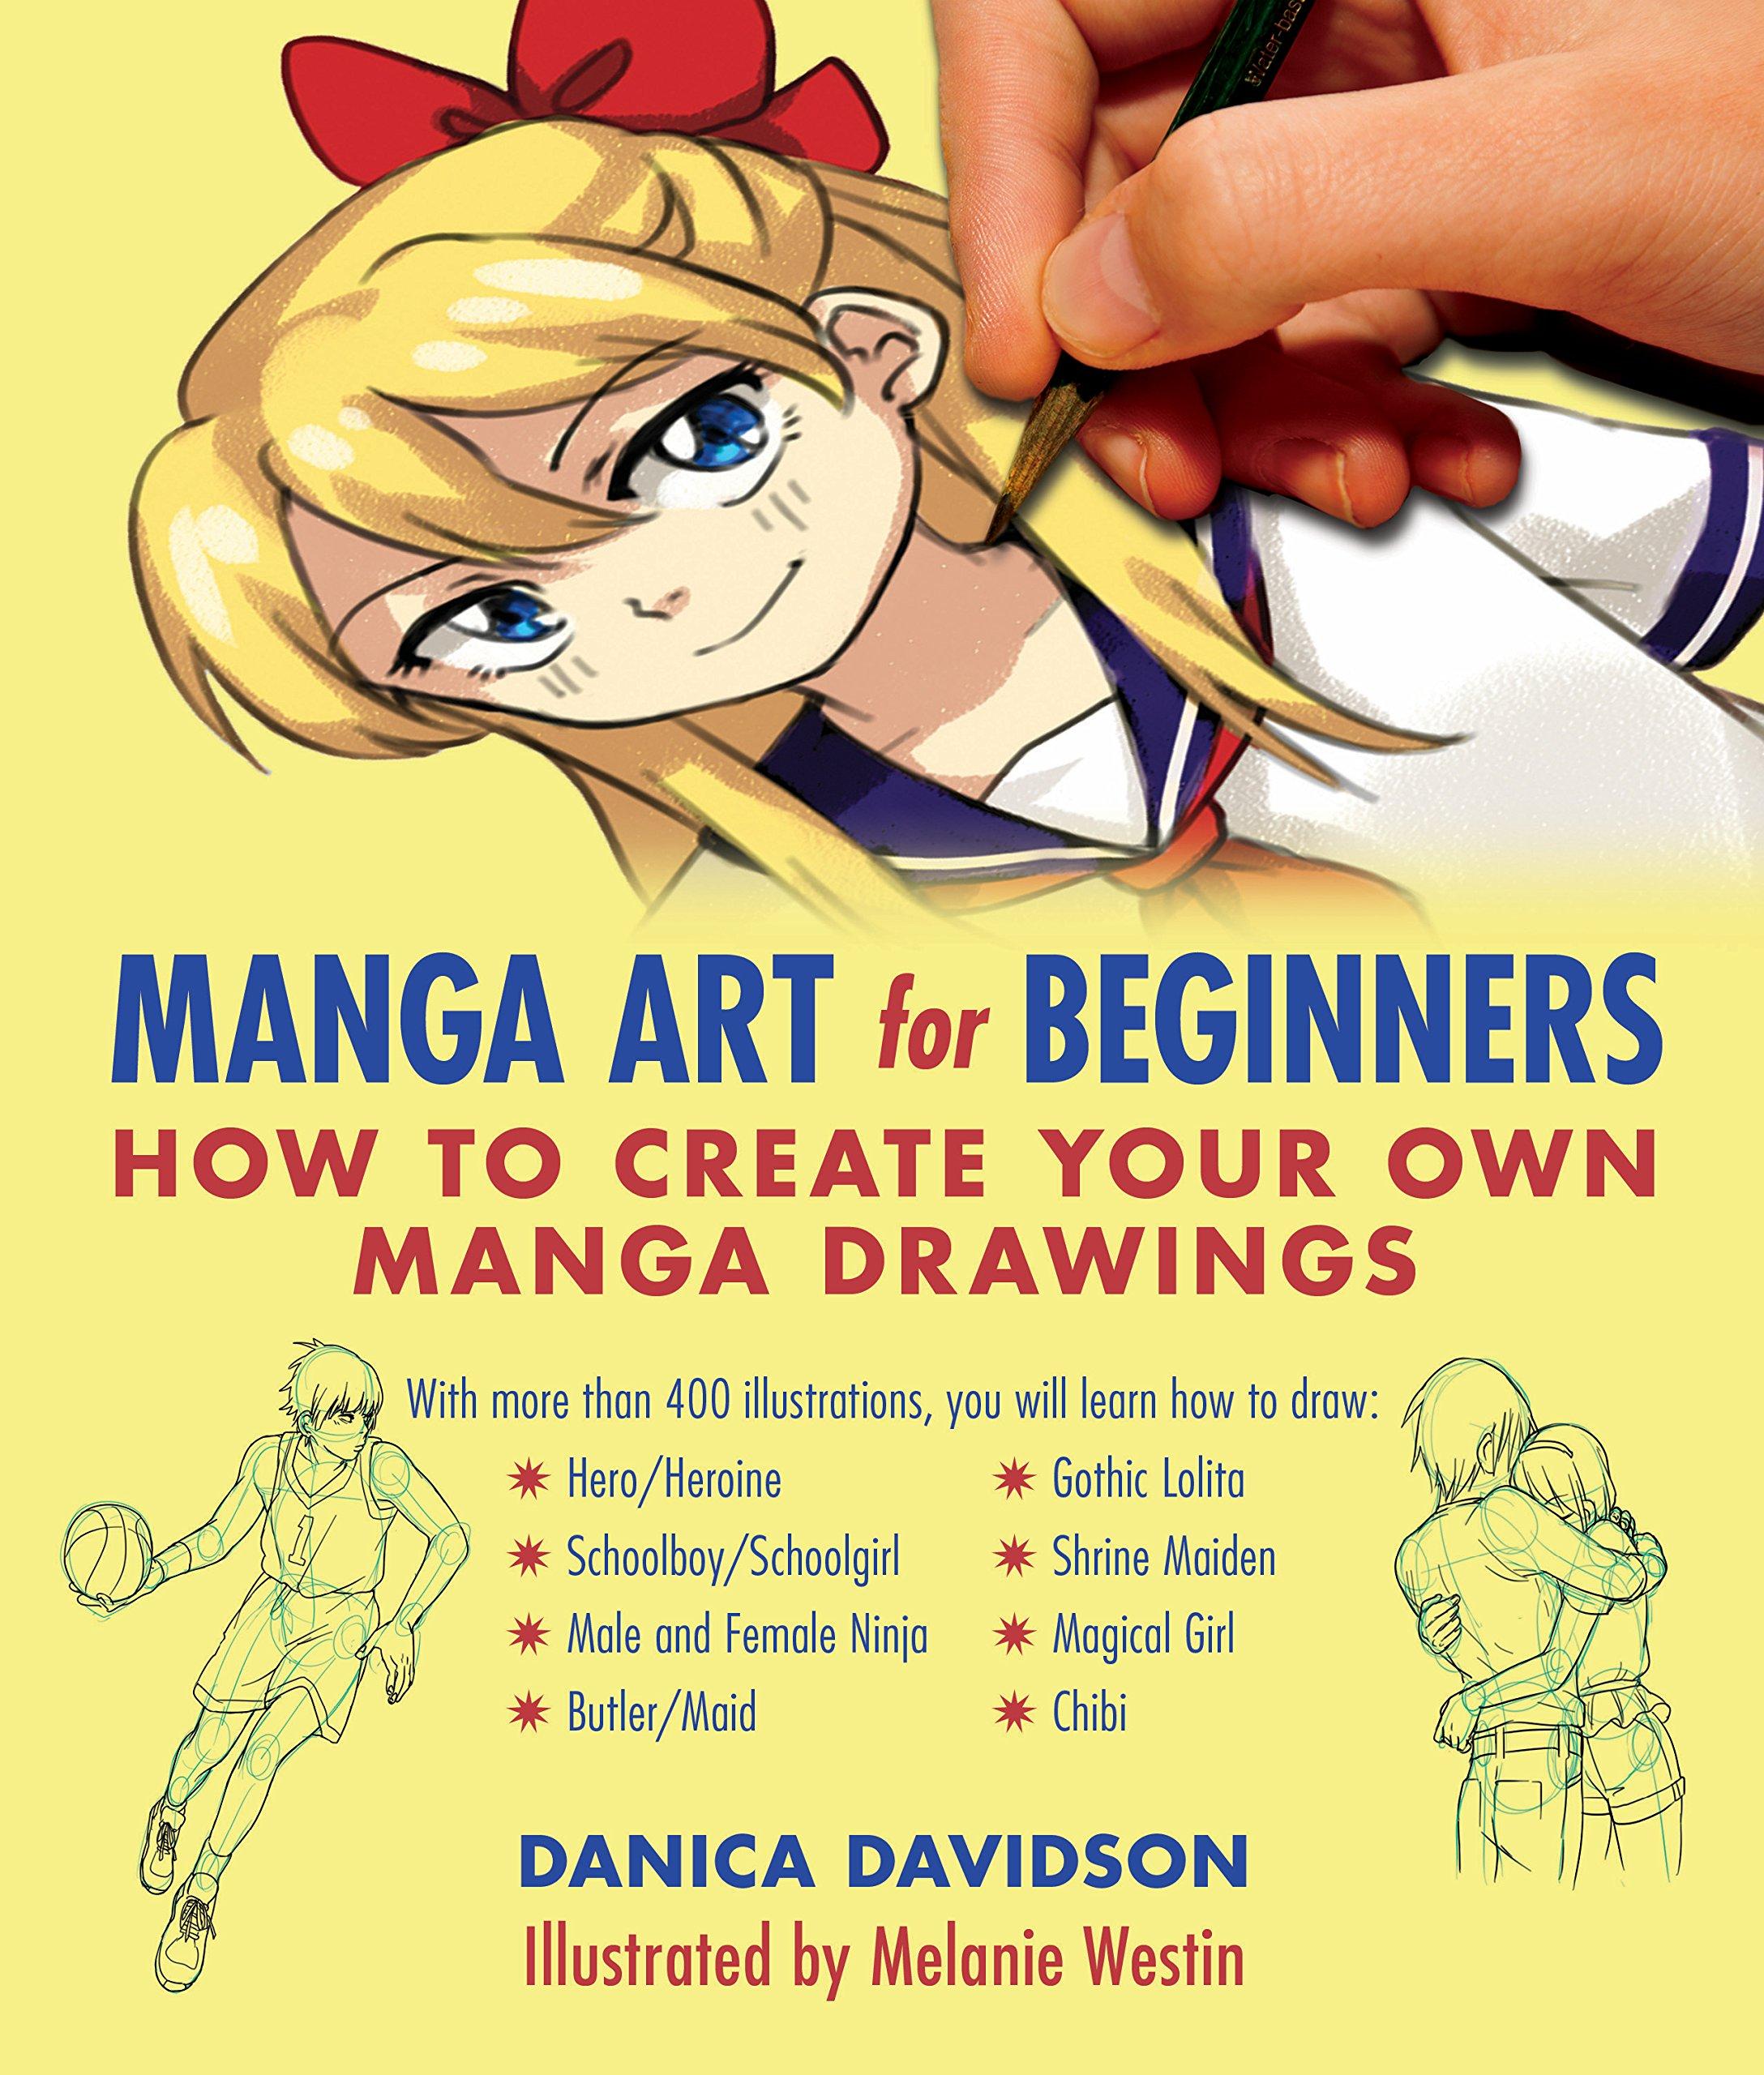 Manga art for beginners how to create your own manga drawings danica davidson melanie westin 9781510700048 amazon com books